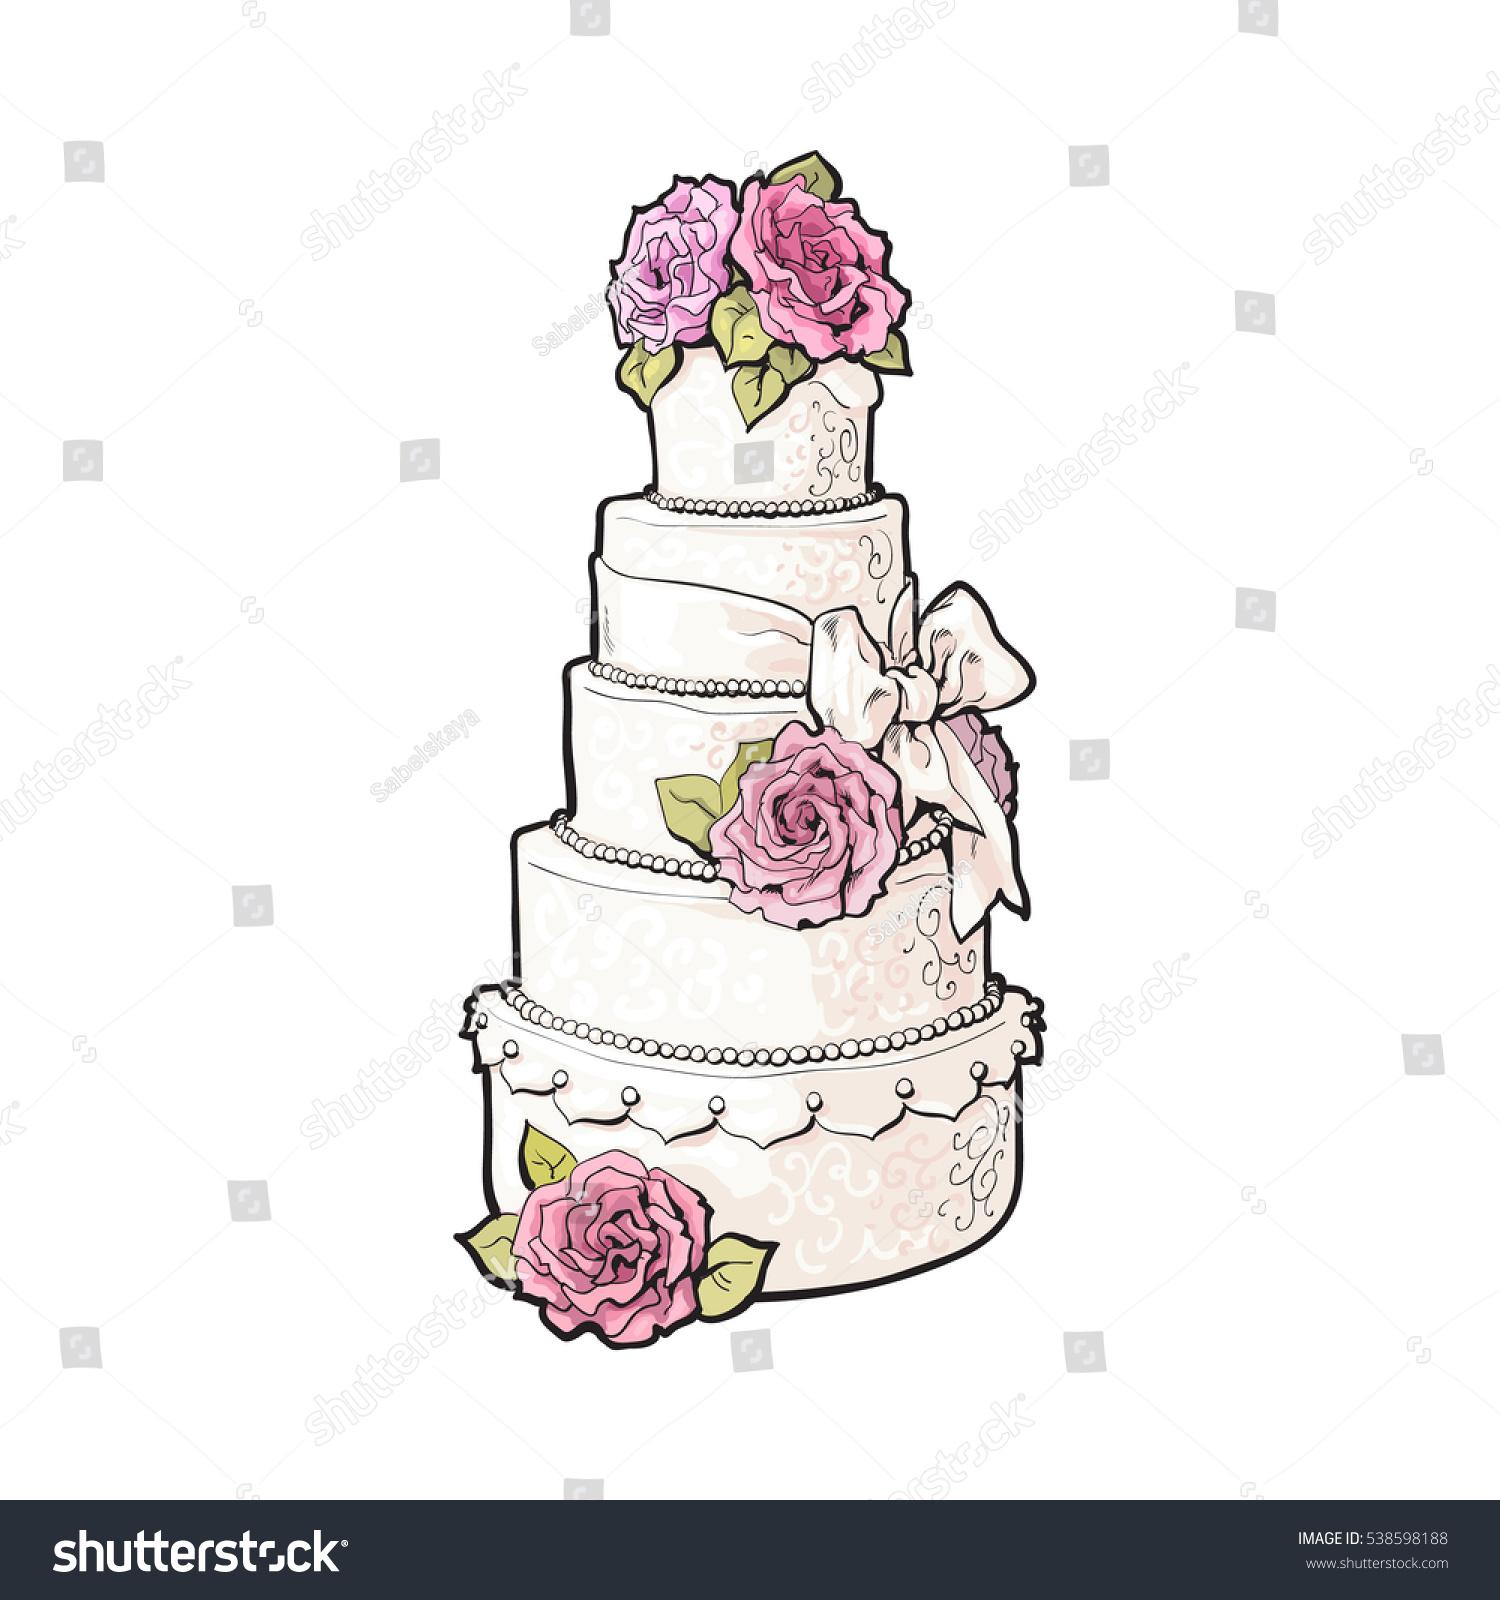 Wedding Cake Cartoon Pictures